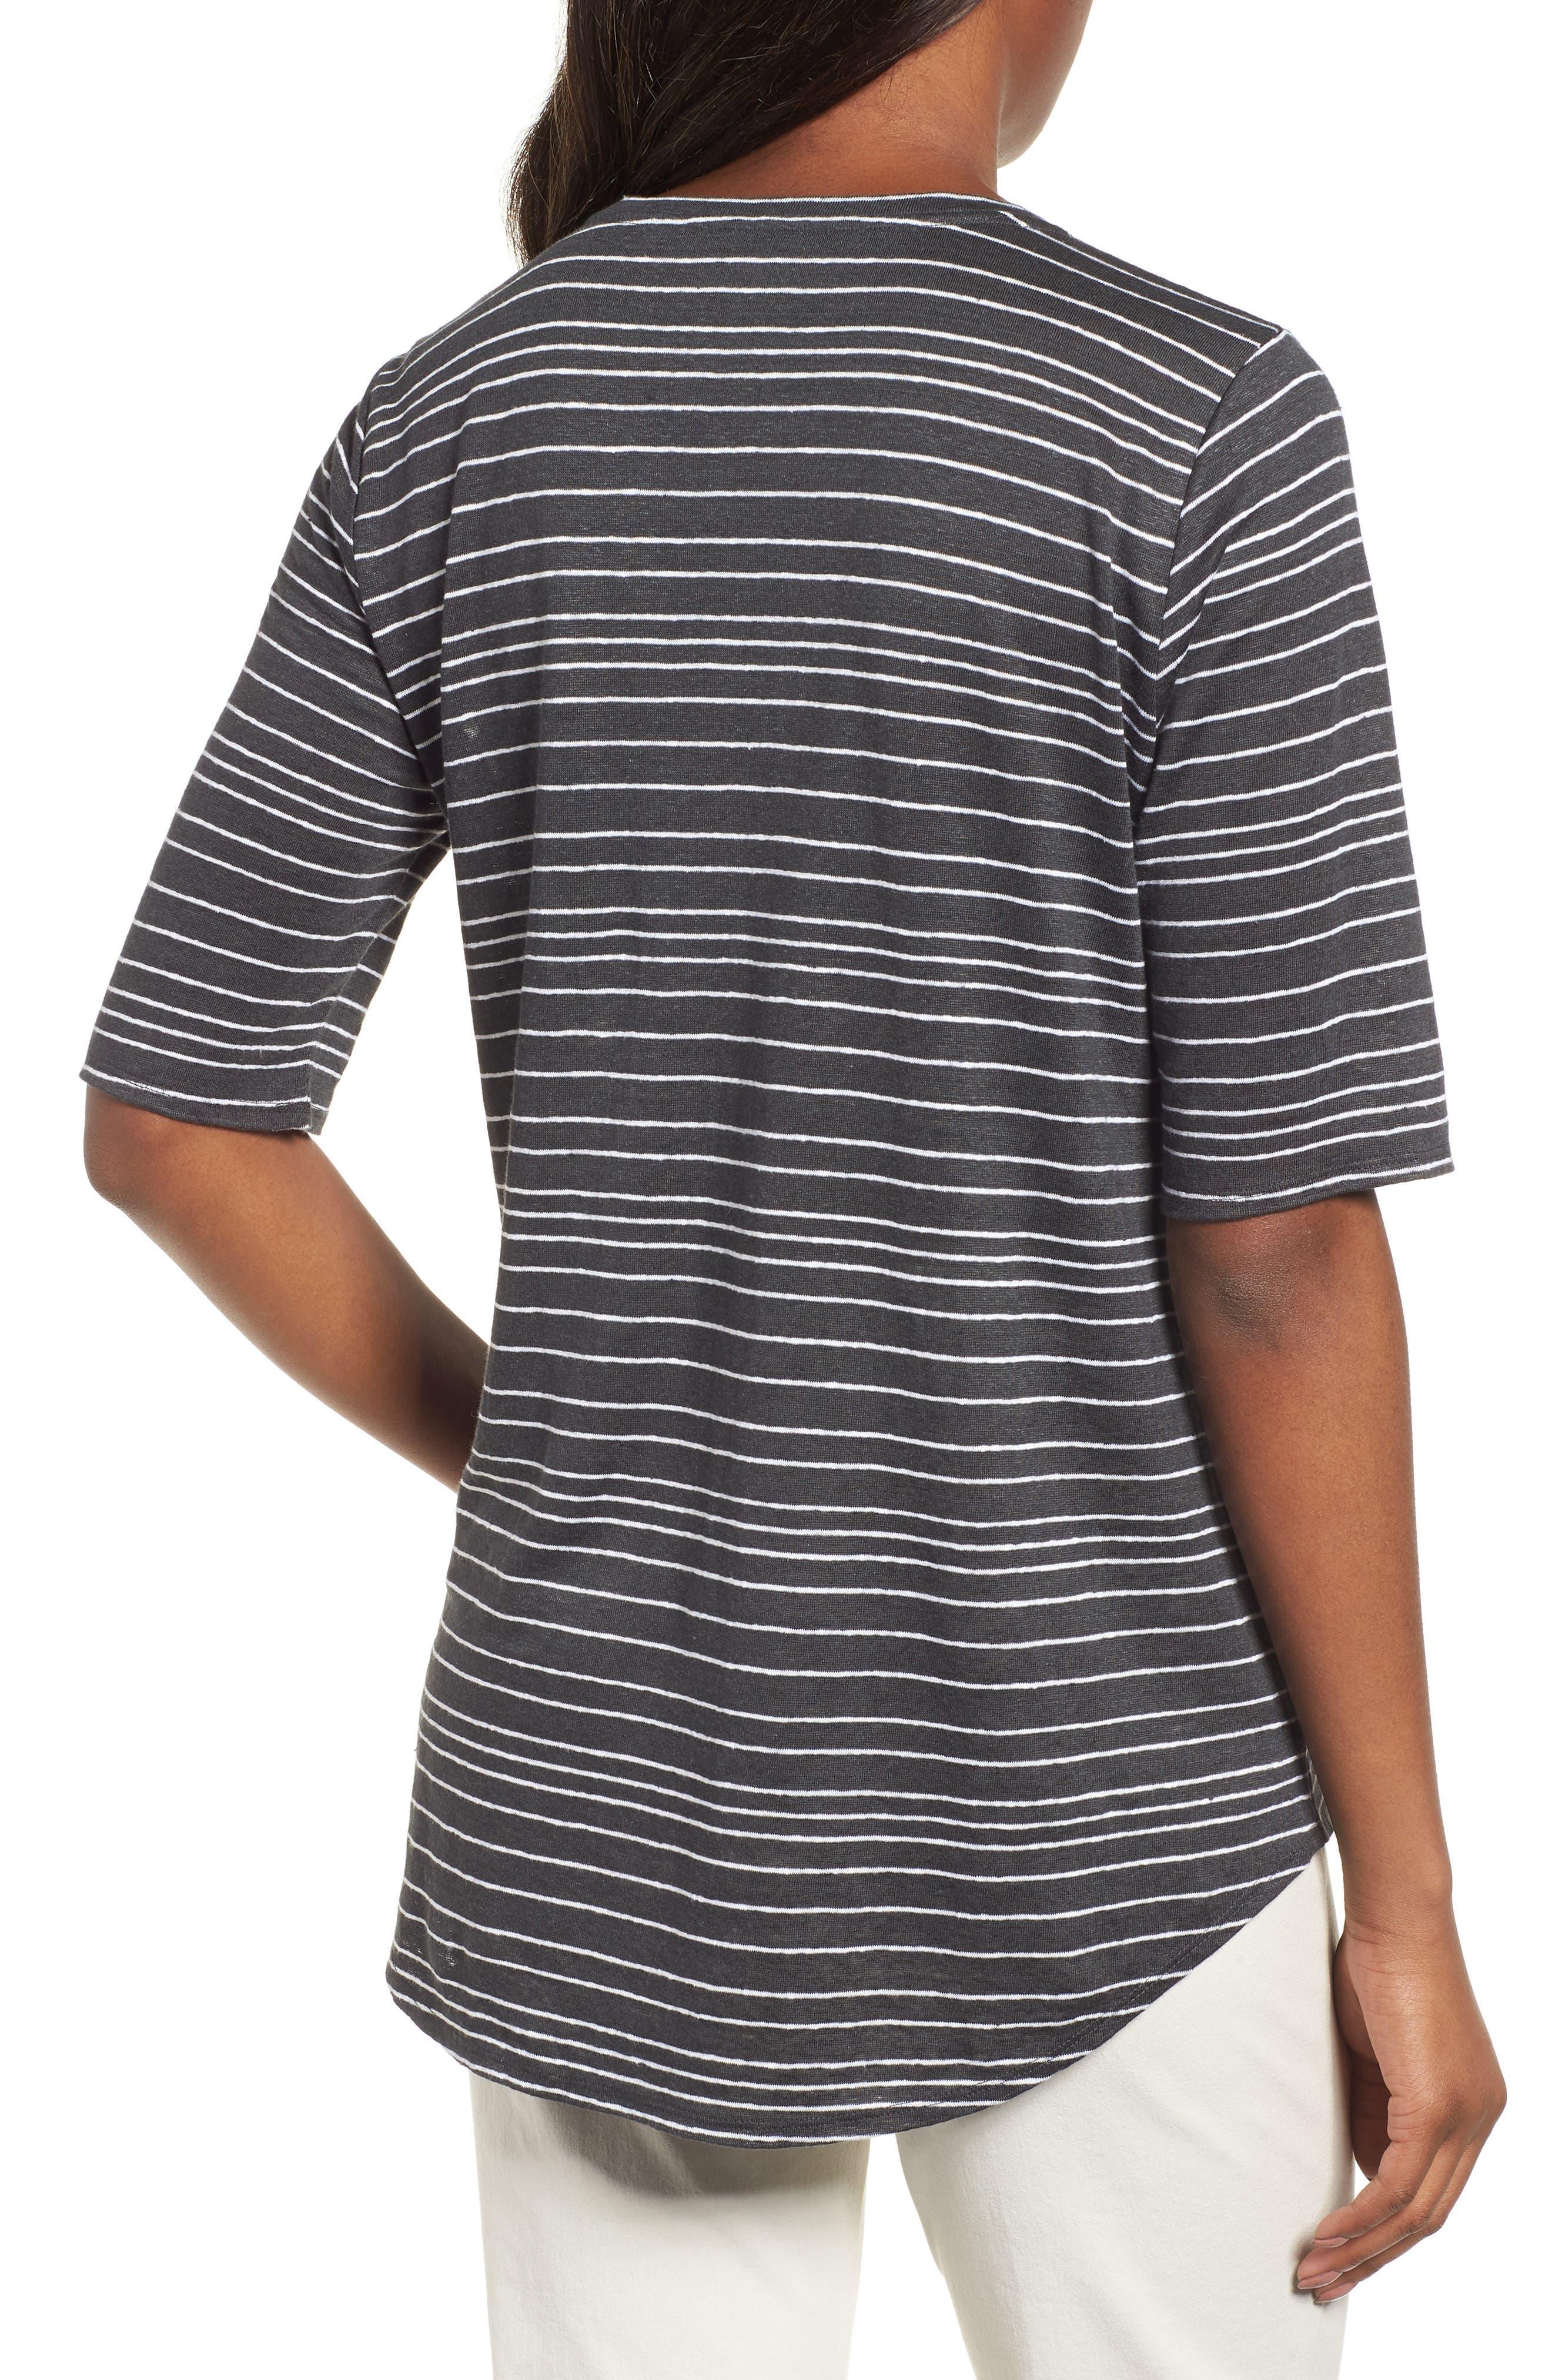 Stripe Organic Linen Top,                             Alternate thumbnail 2, color,                             Graphite